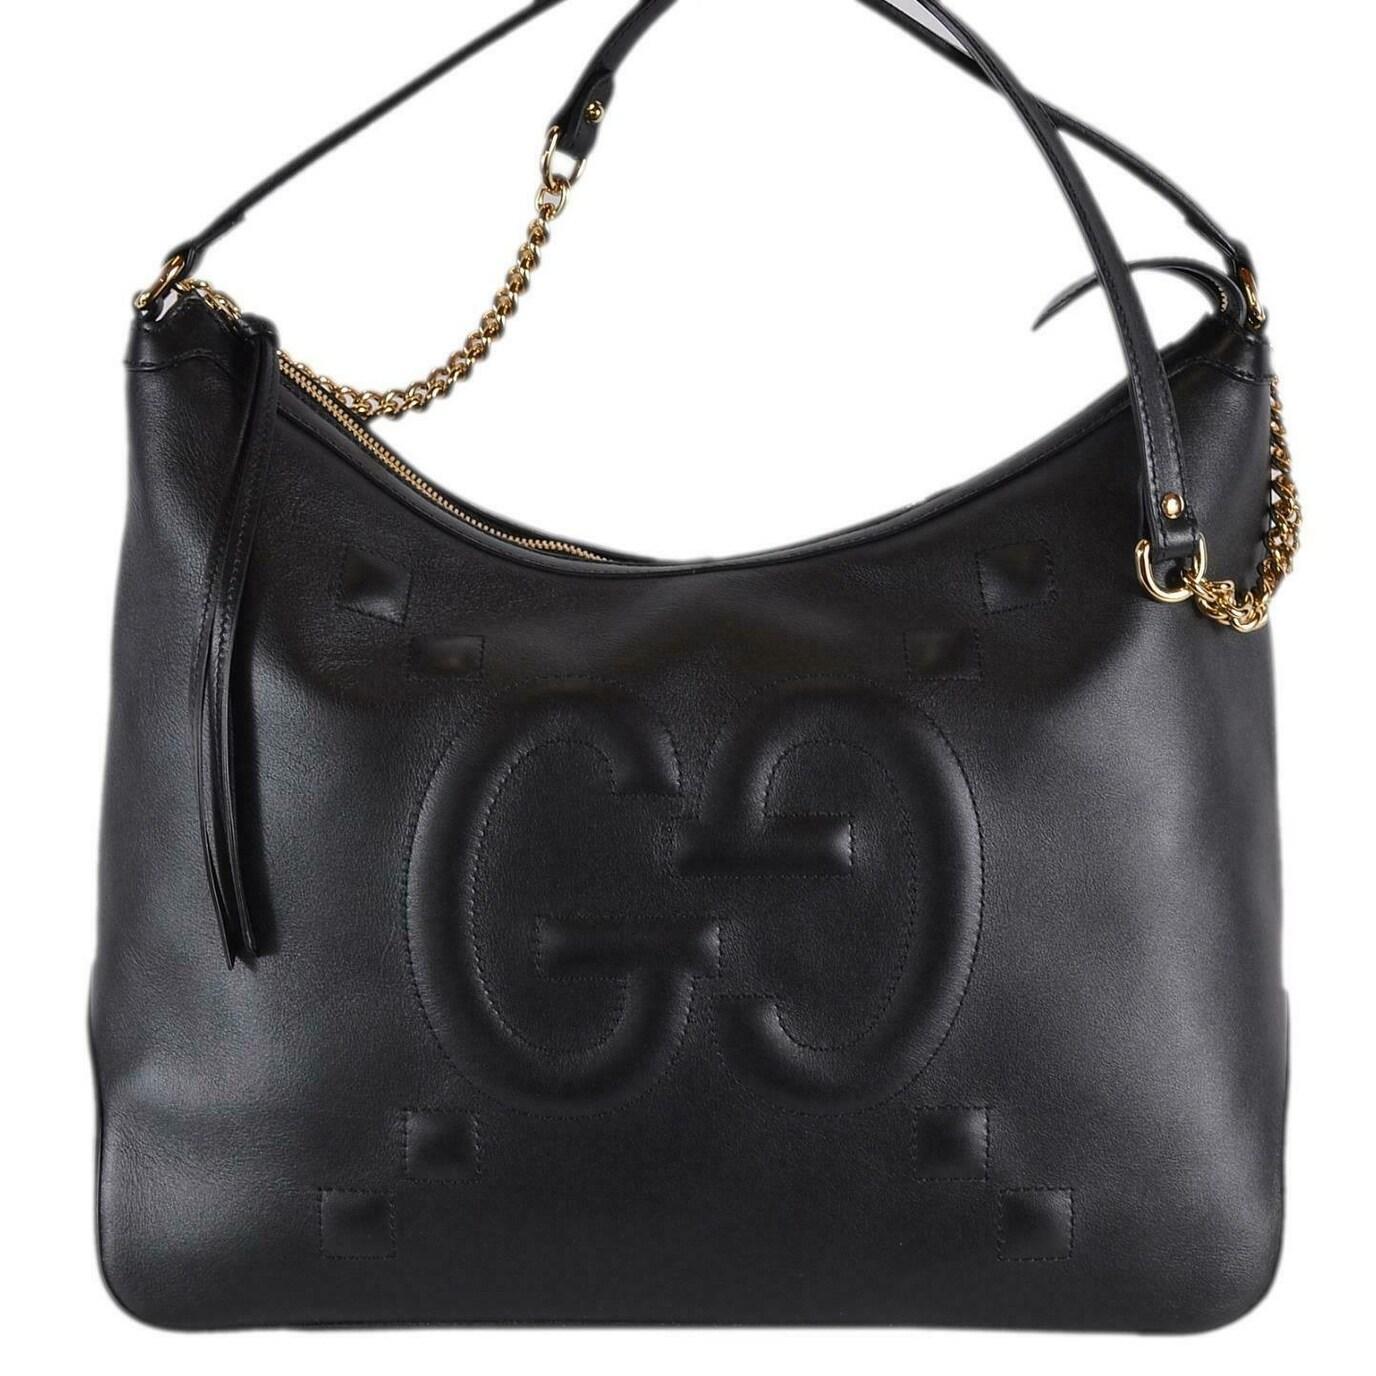 b79668e1a8954 Designer Handbags | Find Great Designer Store Deals Shopping at Overstock